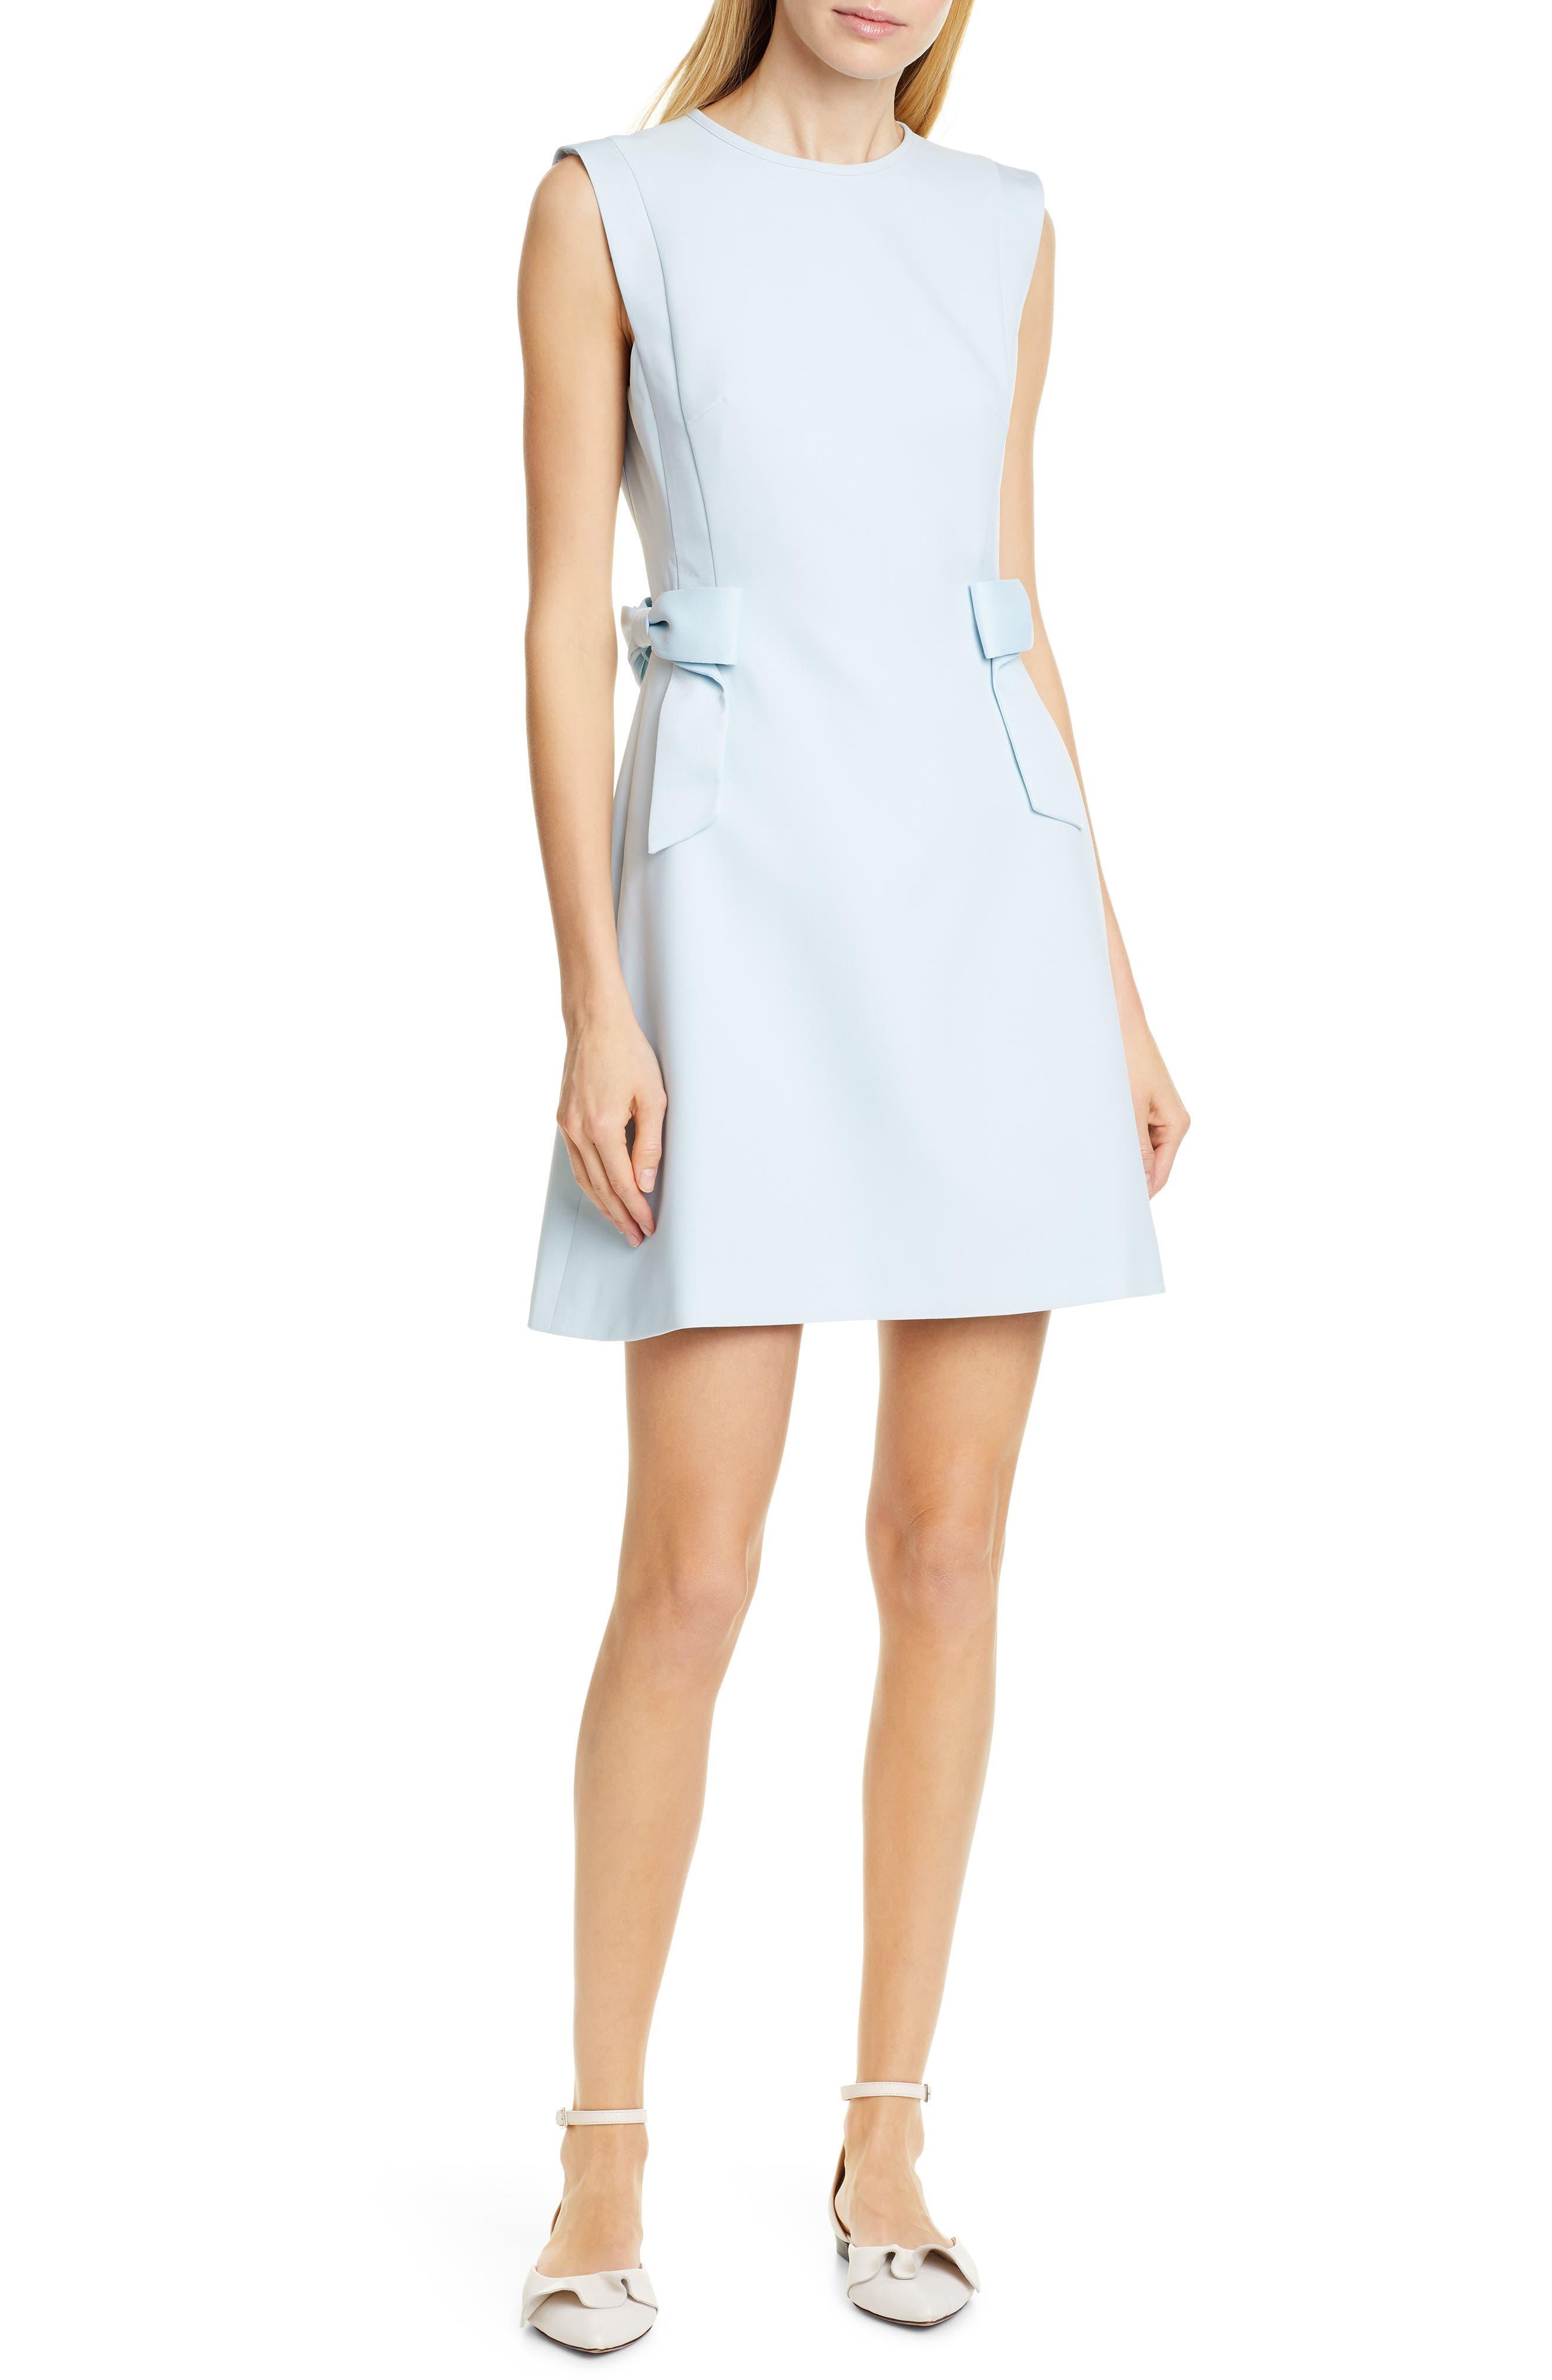 TED BAKER LONDON Meline Side Bow Detail Dress, Main, color, MINT